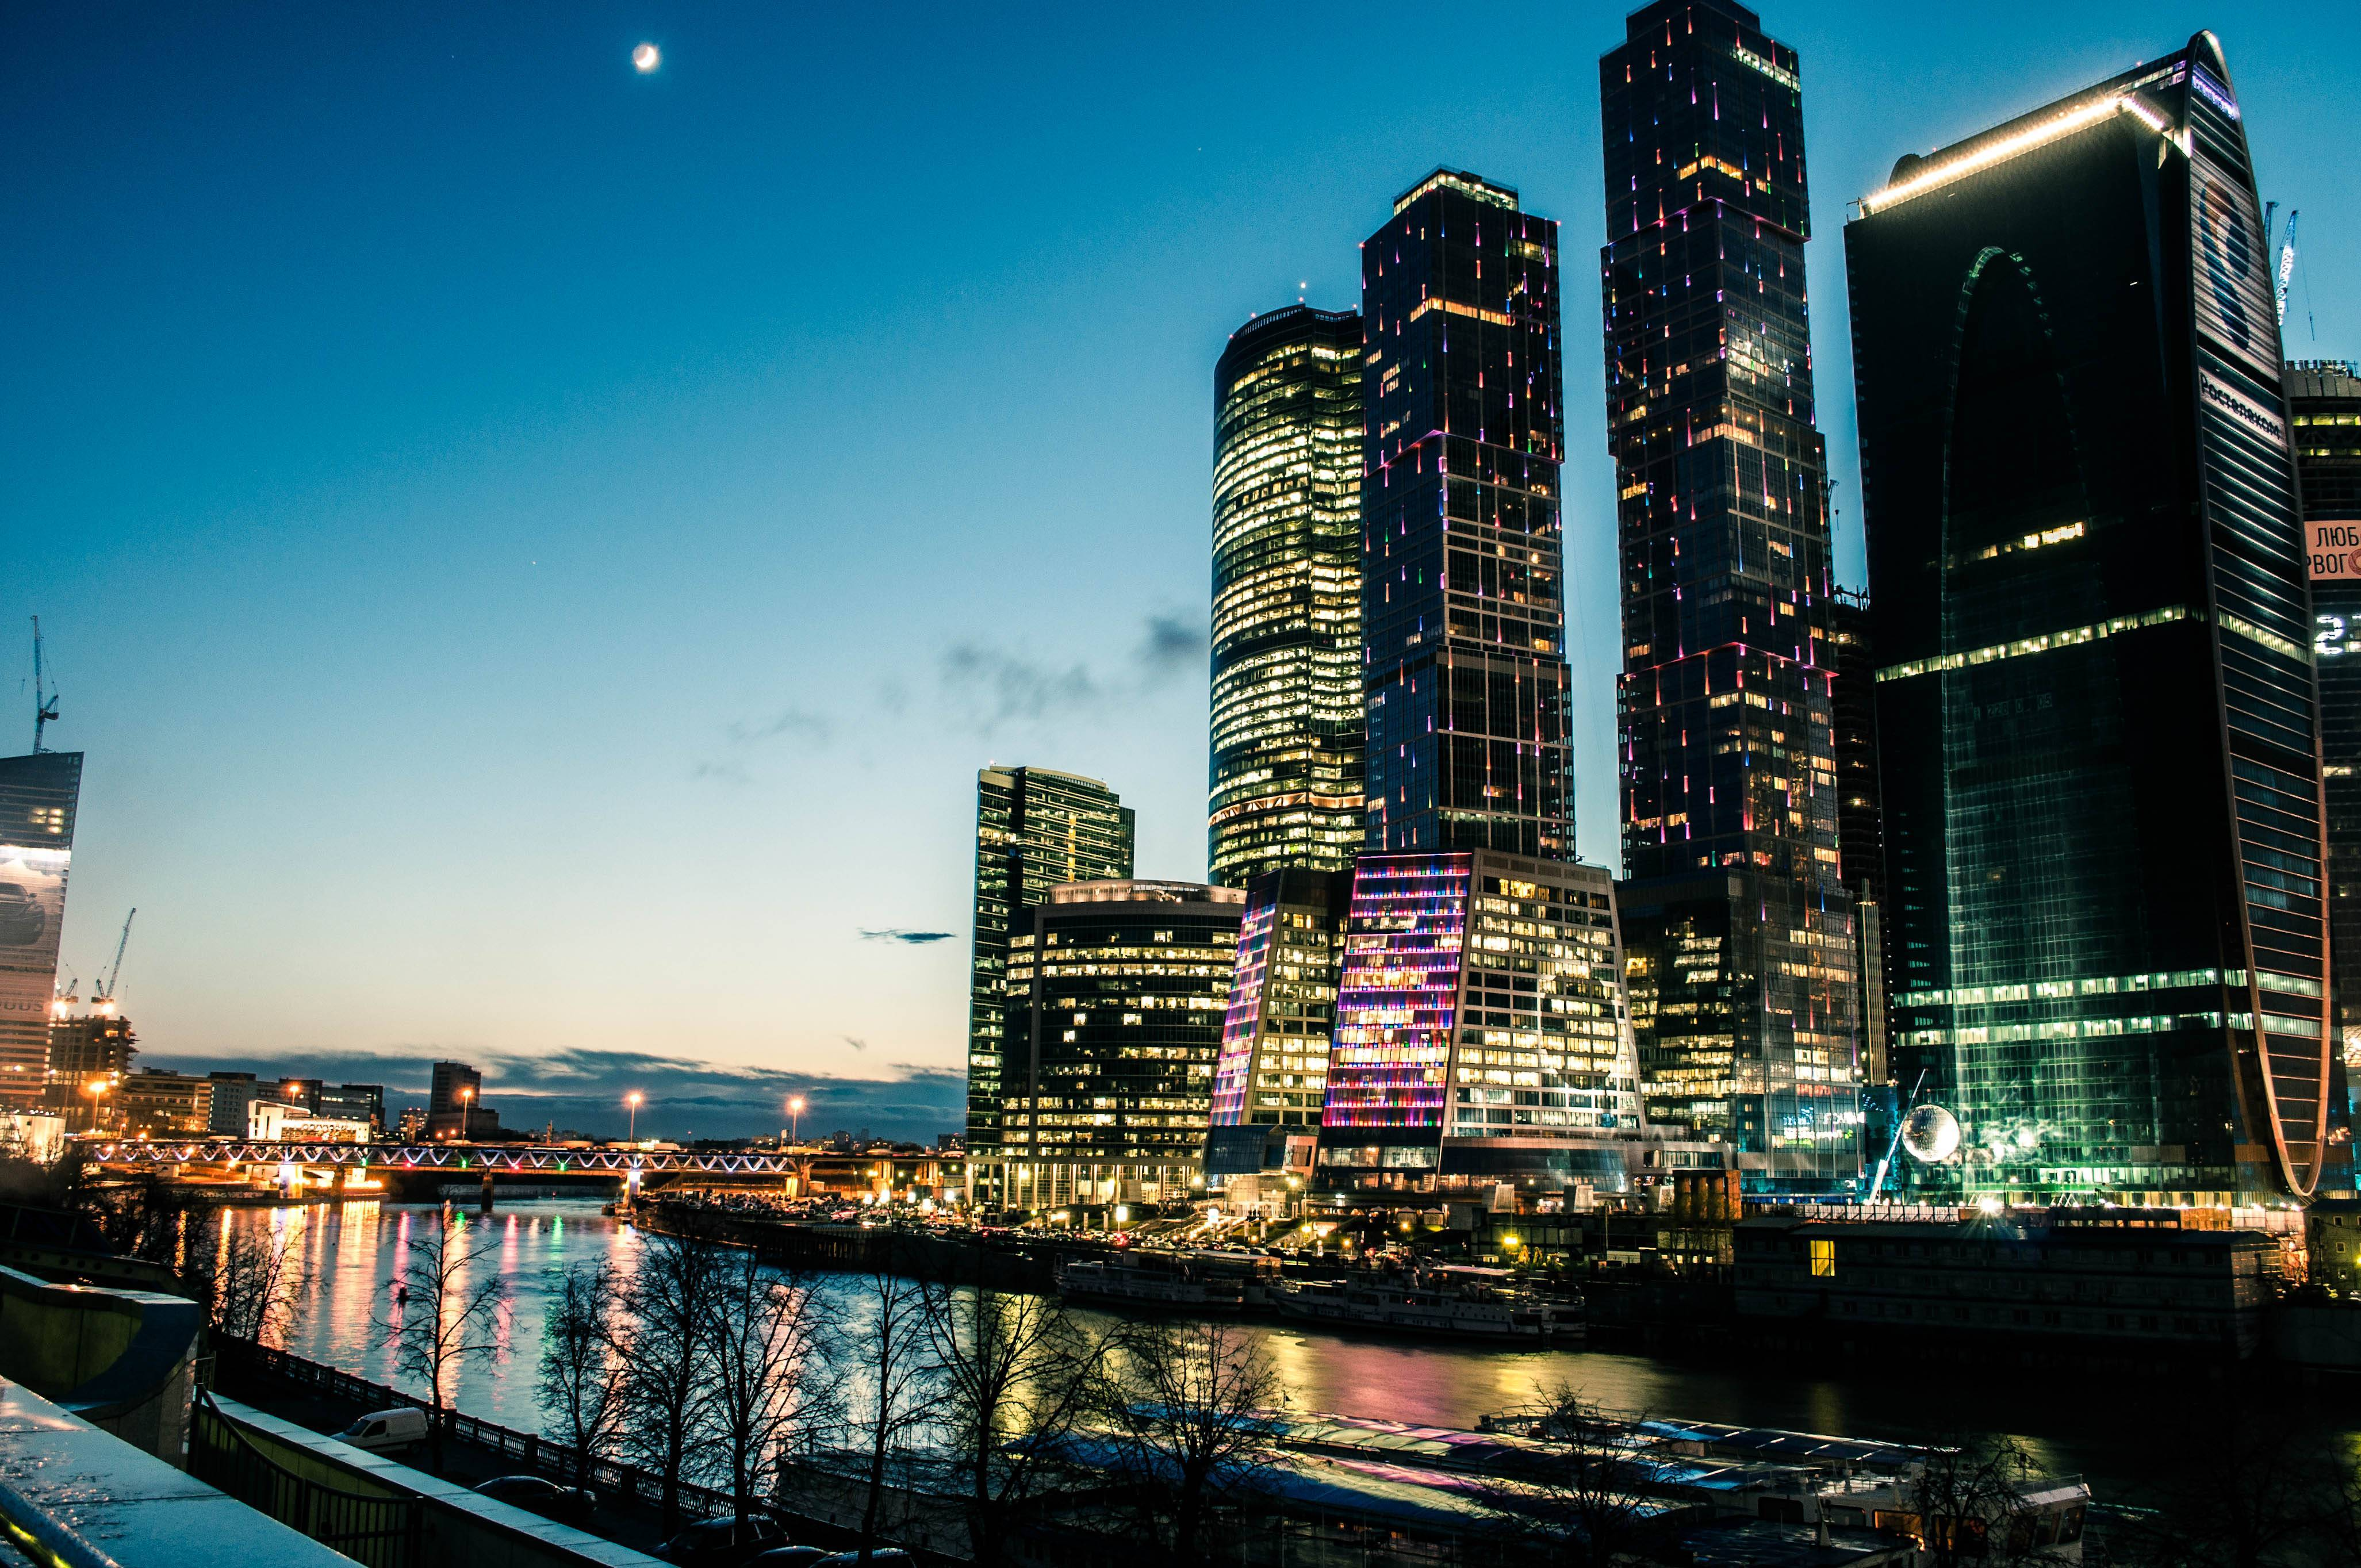 В «Москва-сити» появятся хостелы